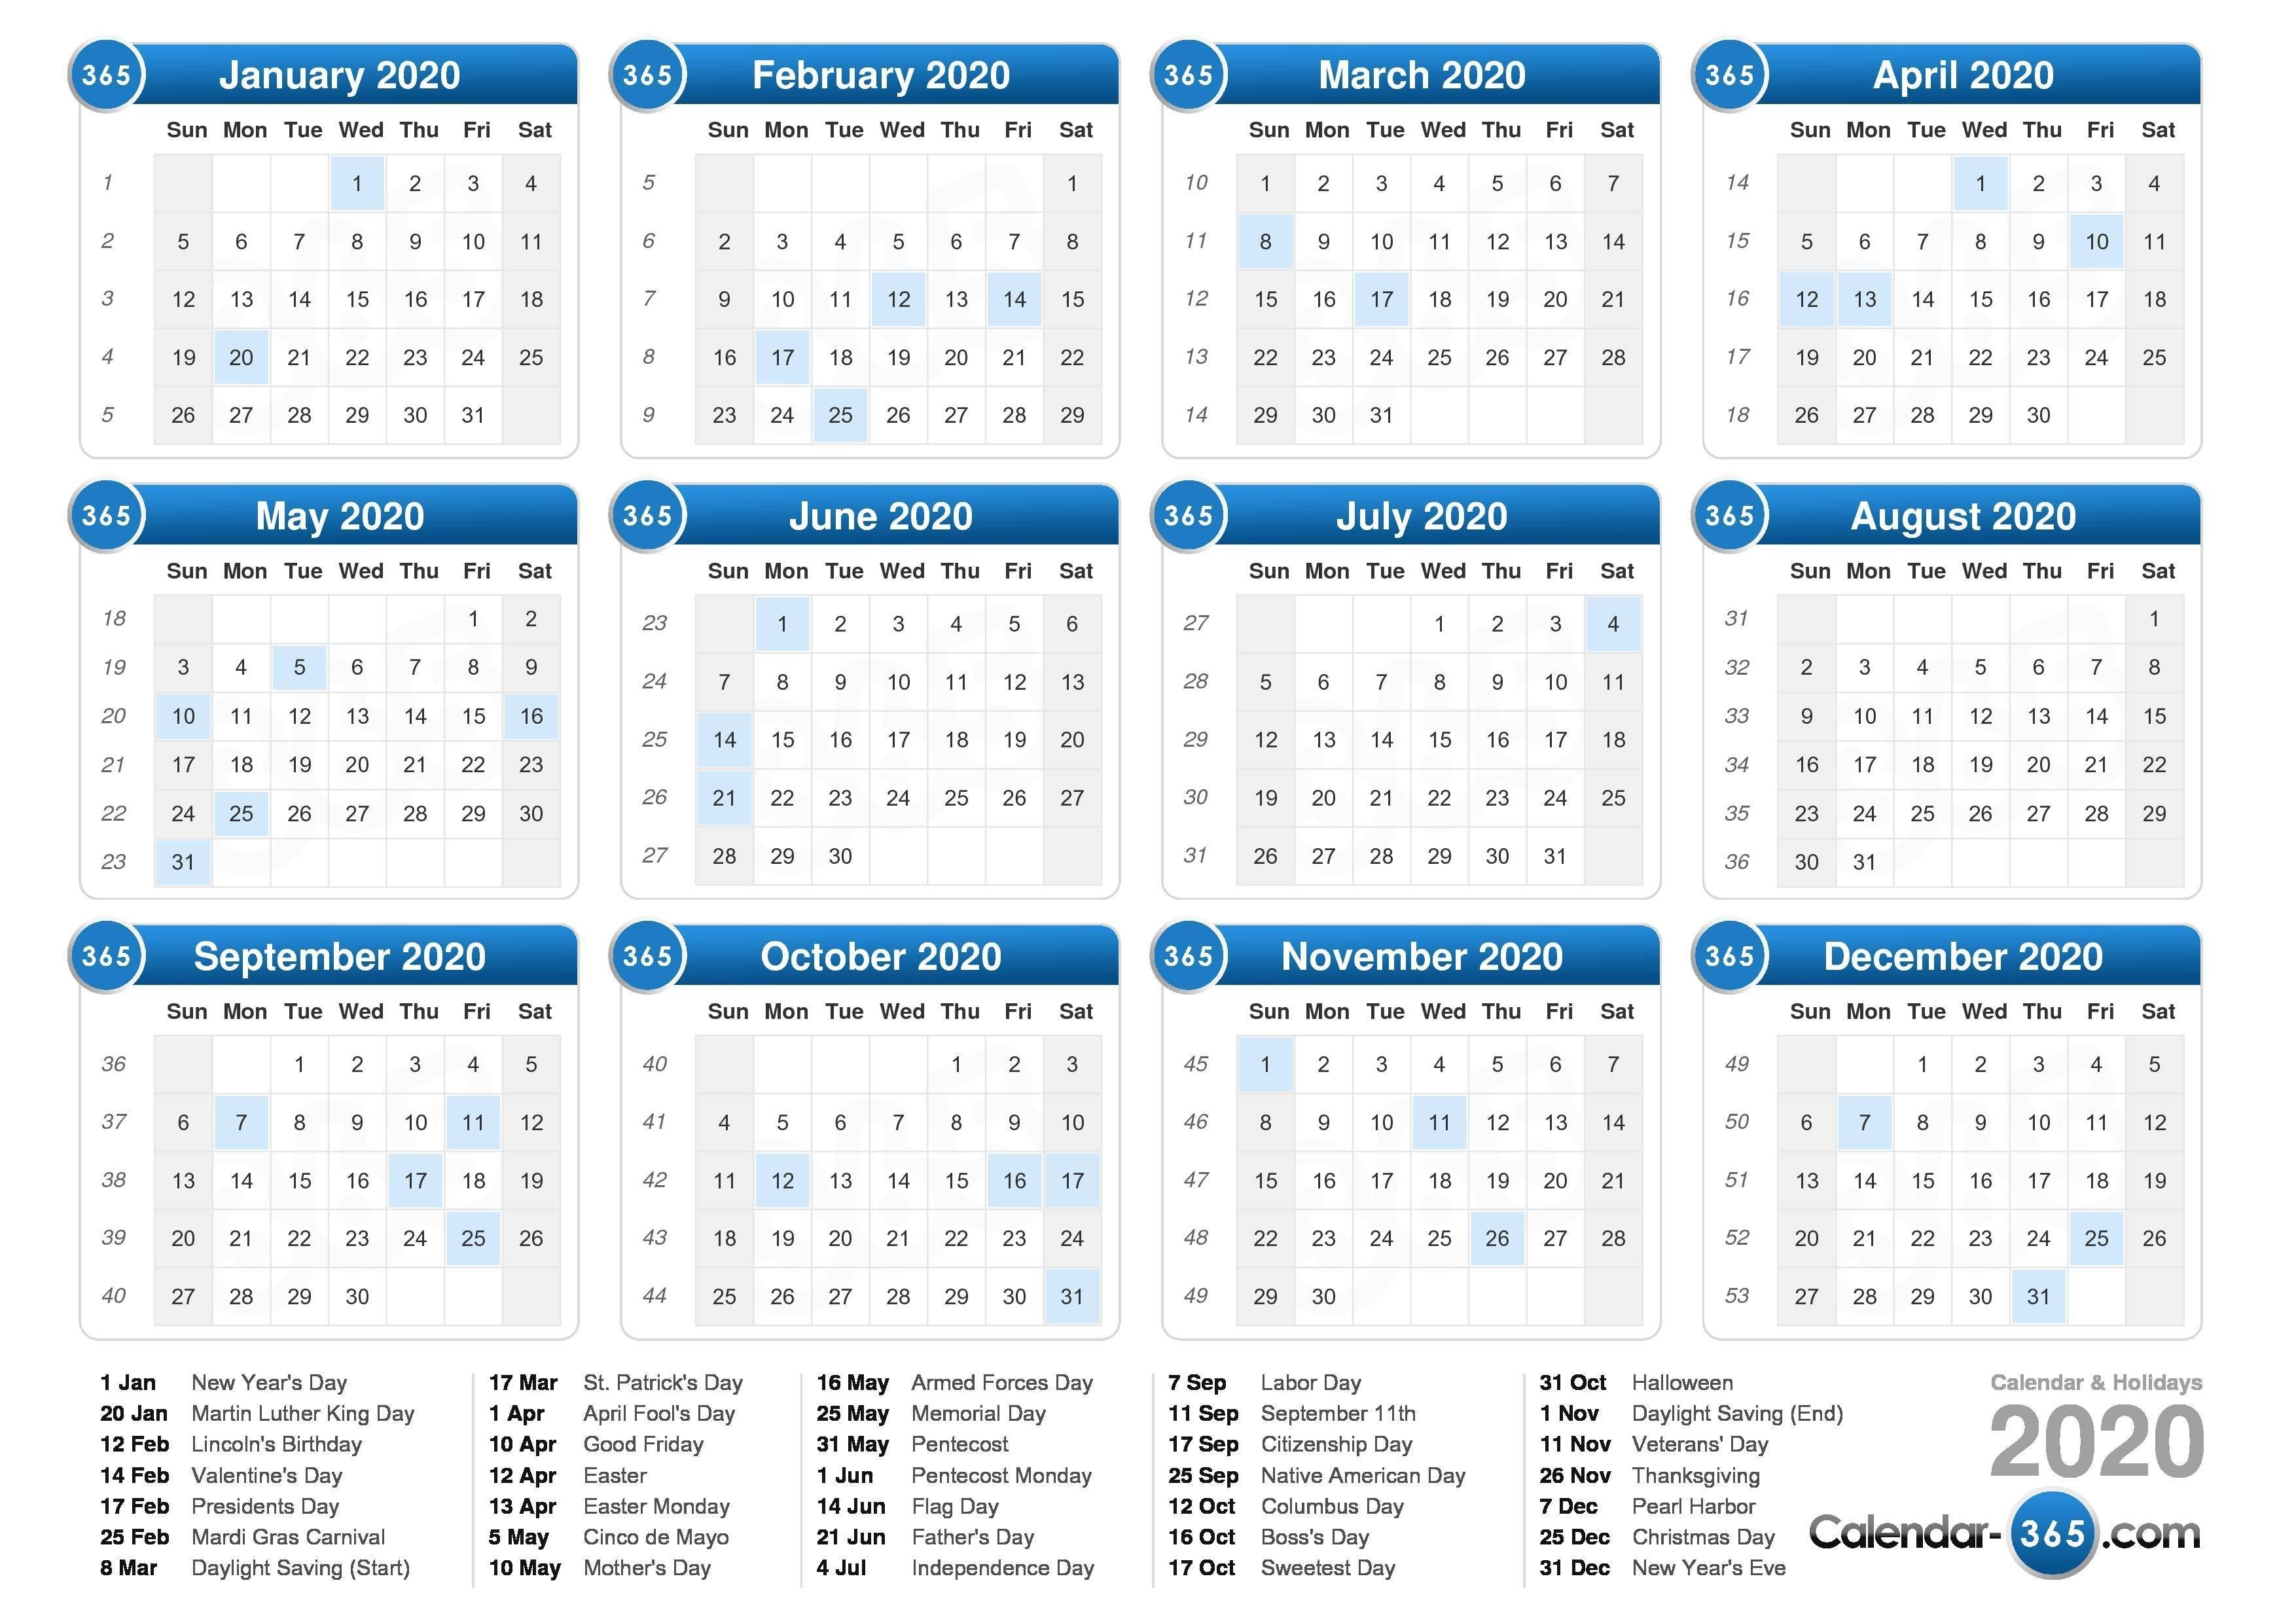 2020 Calendar-January 2020 Calendar With Holidays South Africa